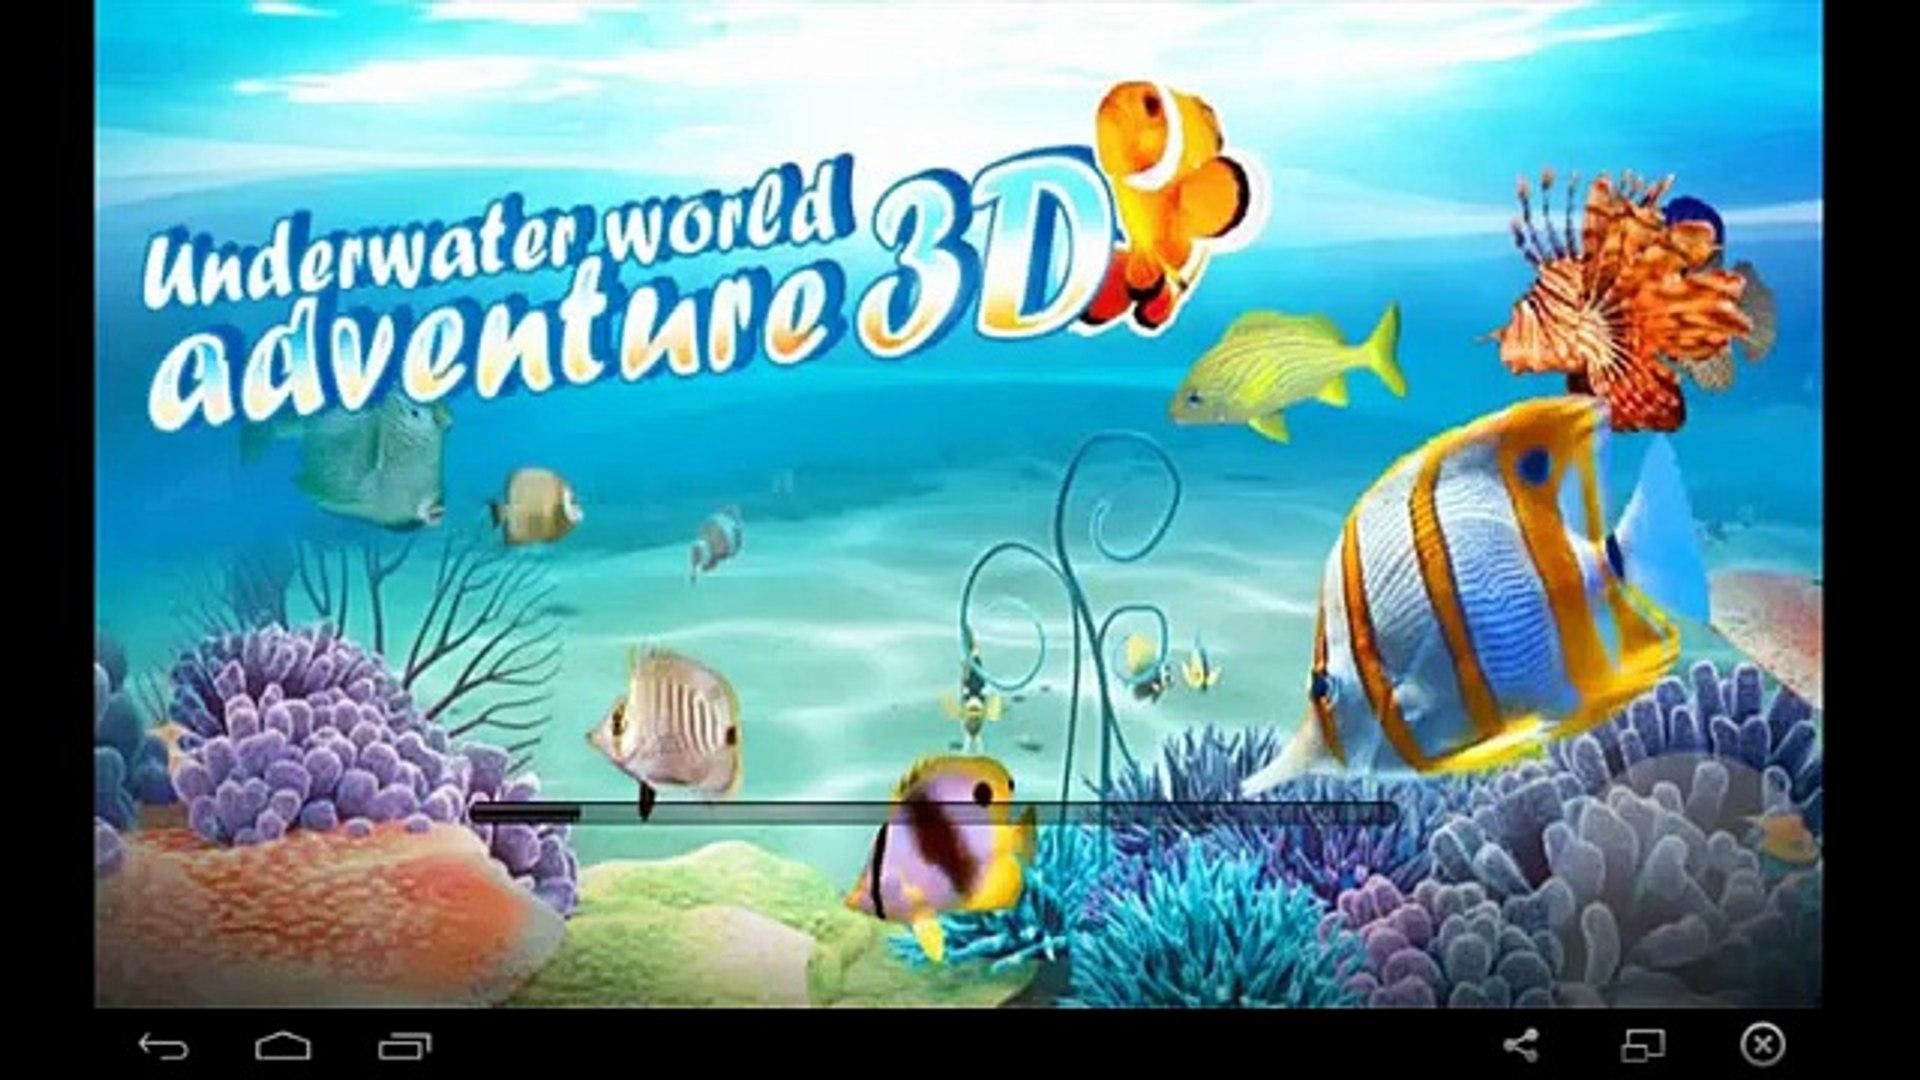 Подводный мир приключений 3D / The underwater world of adventure 3D - for Android GamePlay